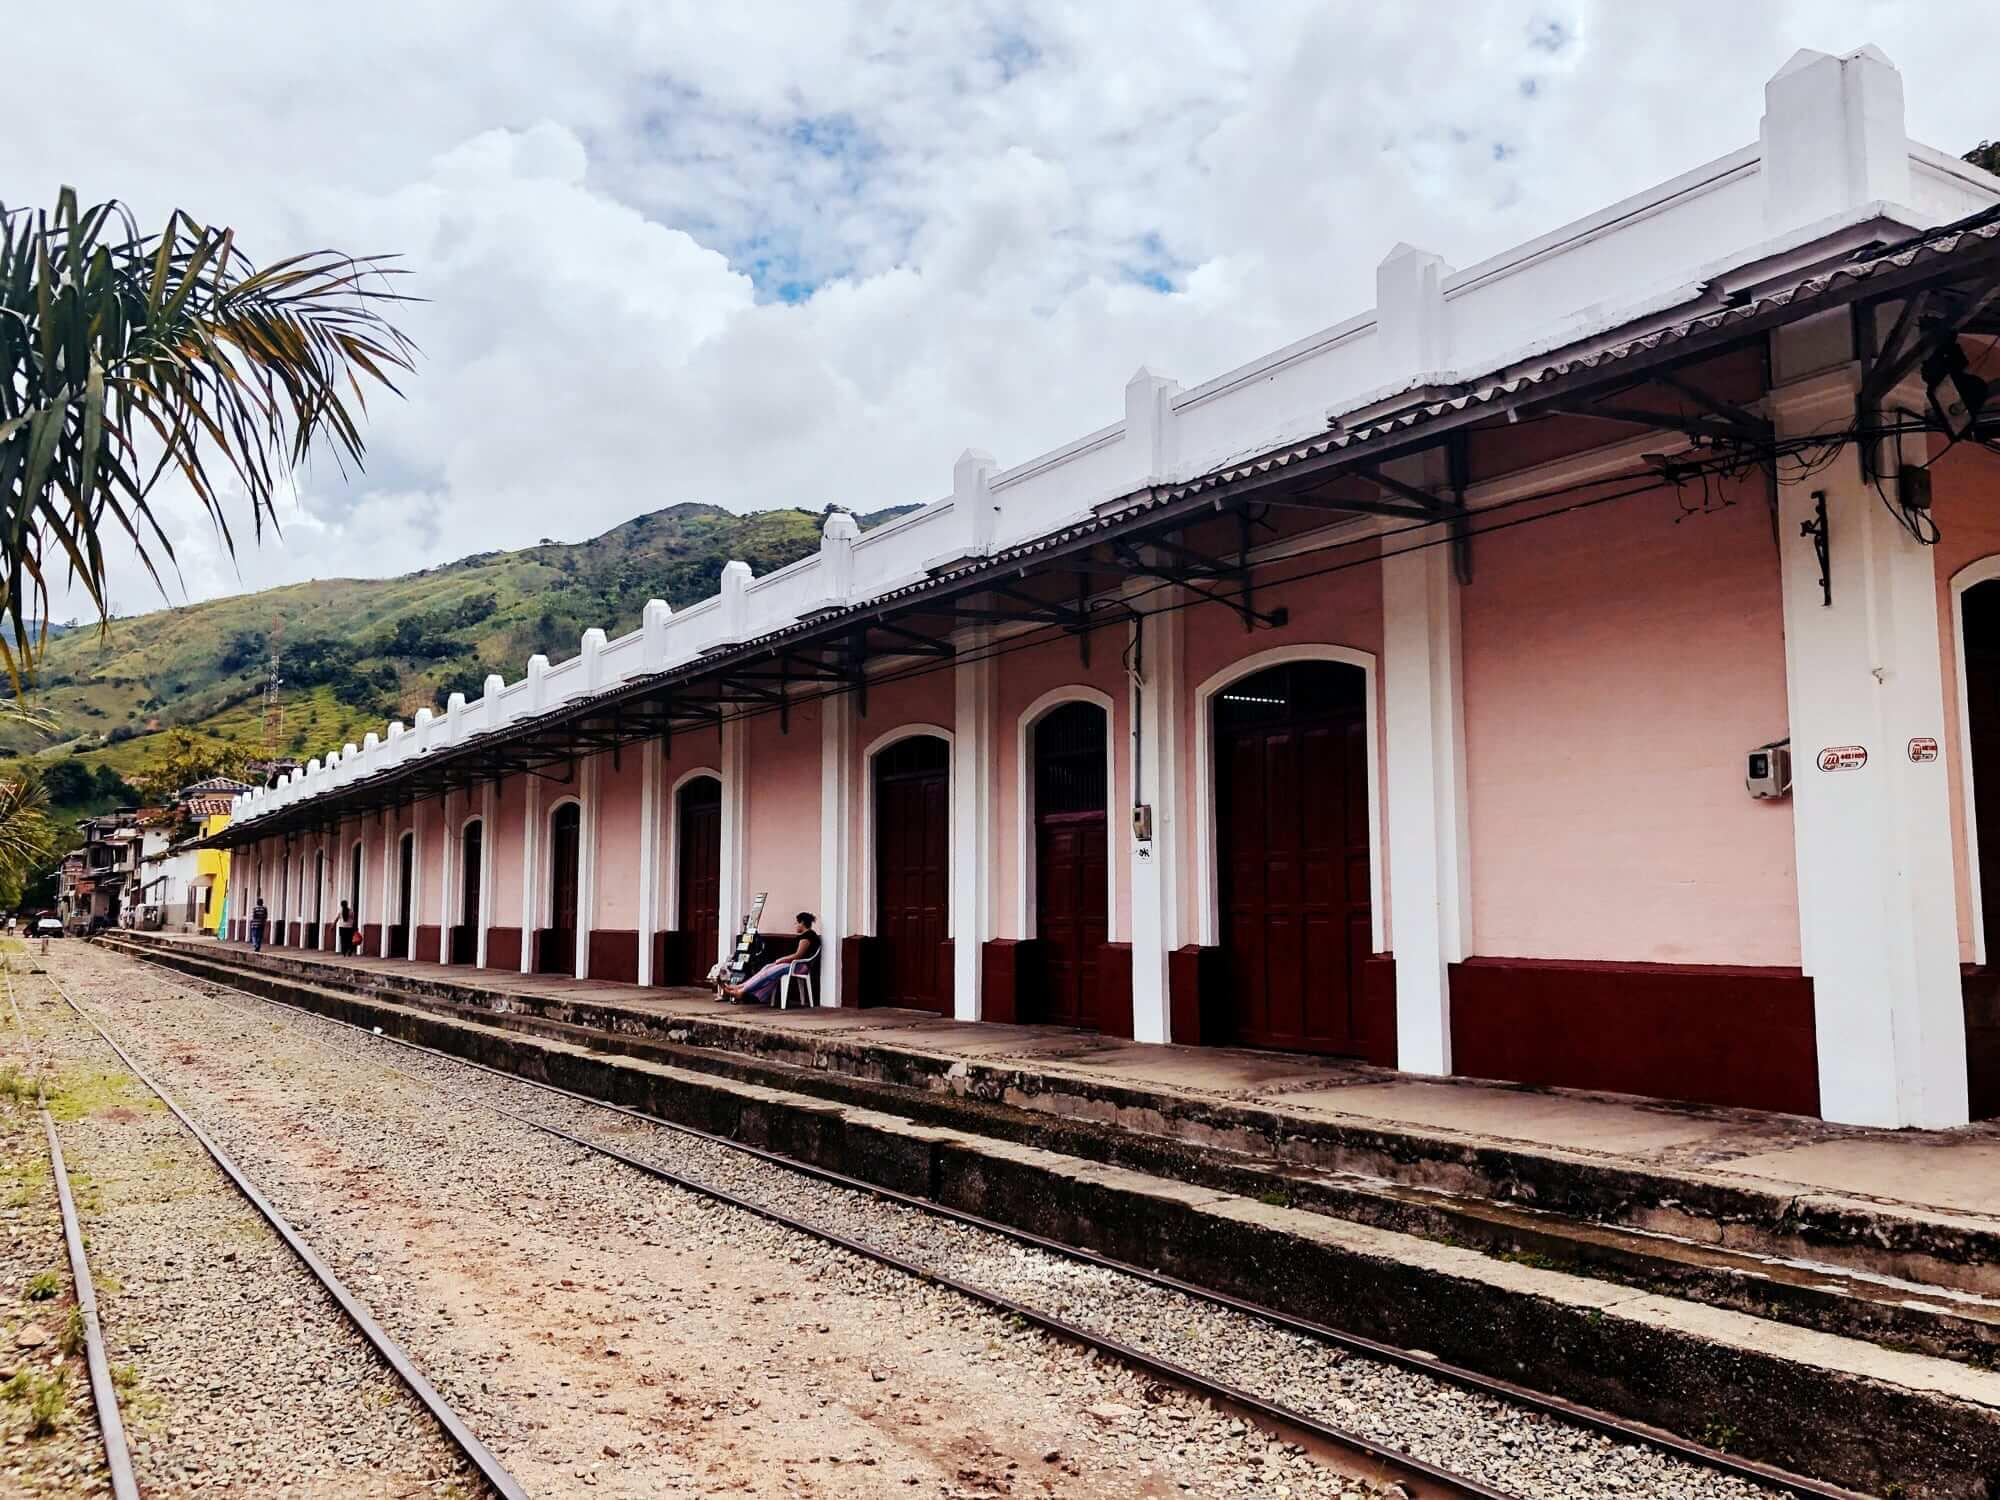 Cisneros Railway Station, Antioquia Railway, Colombia